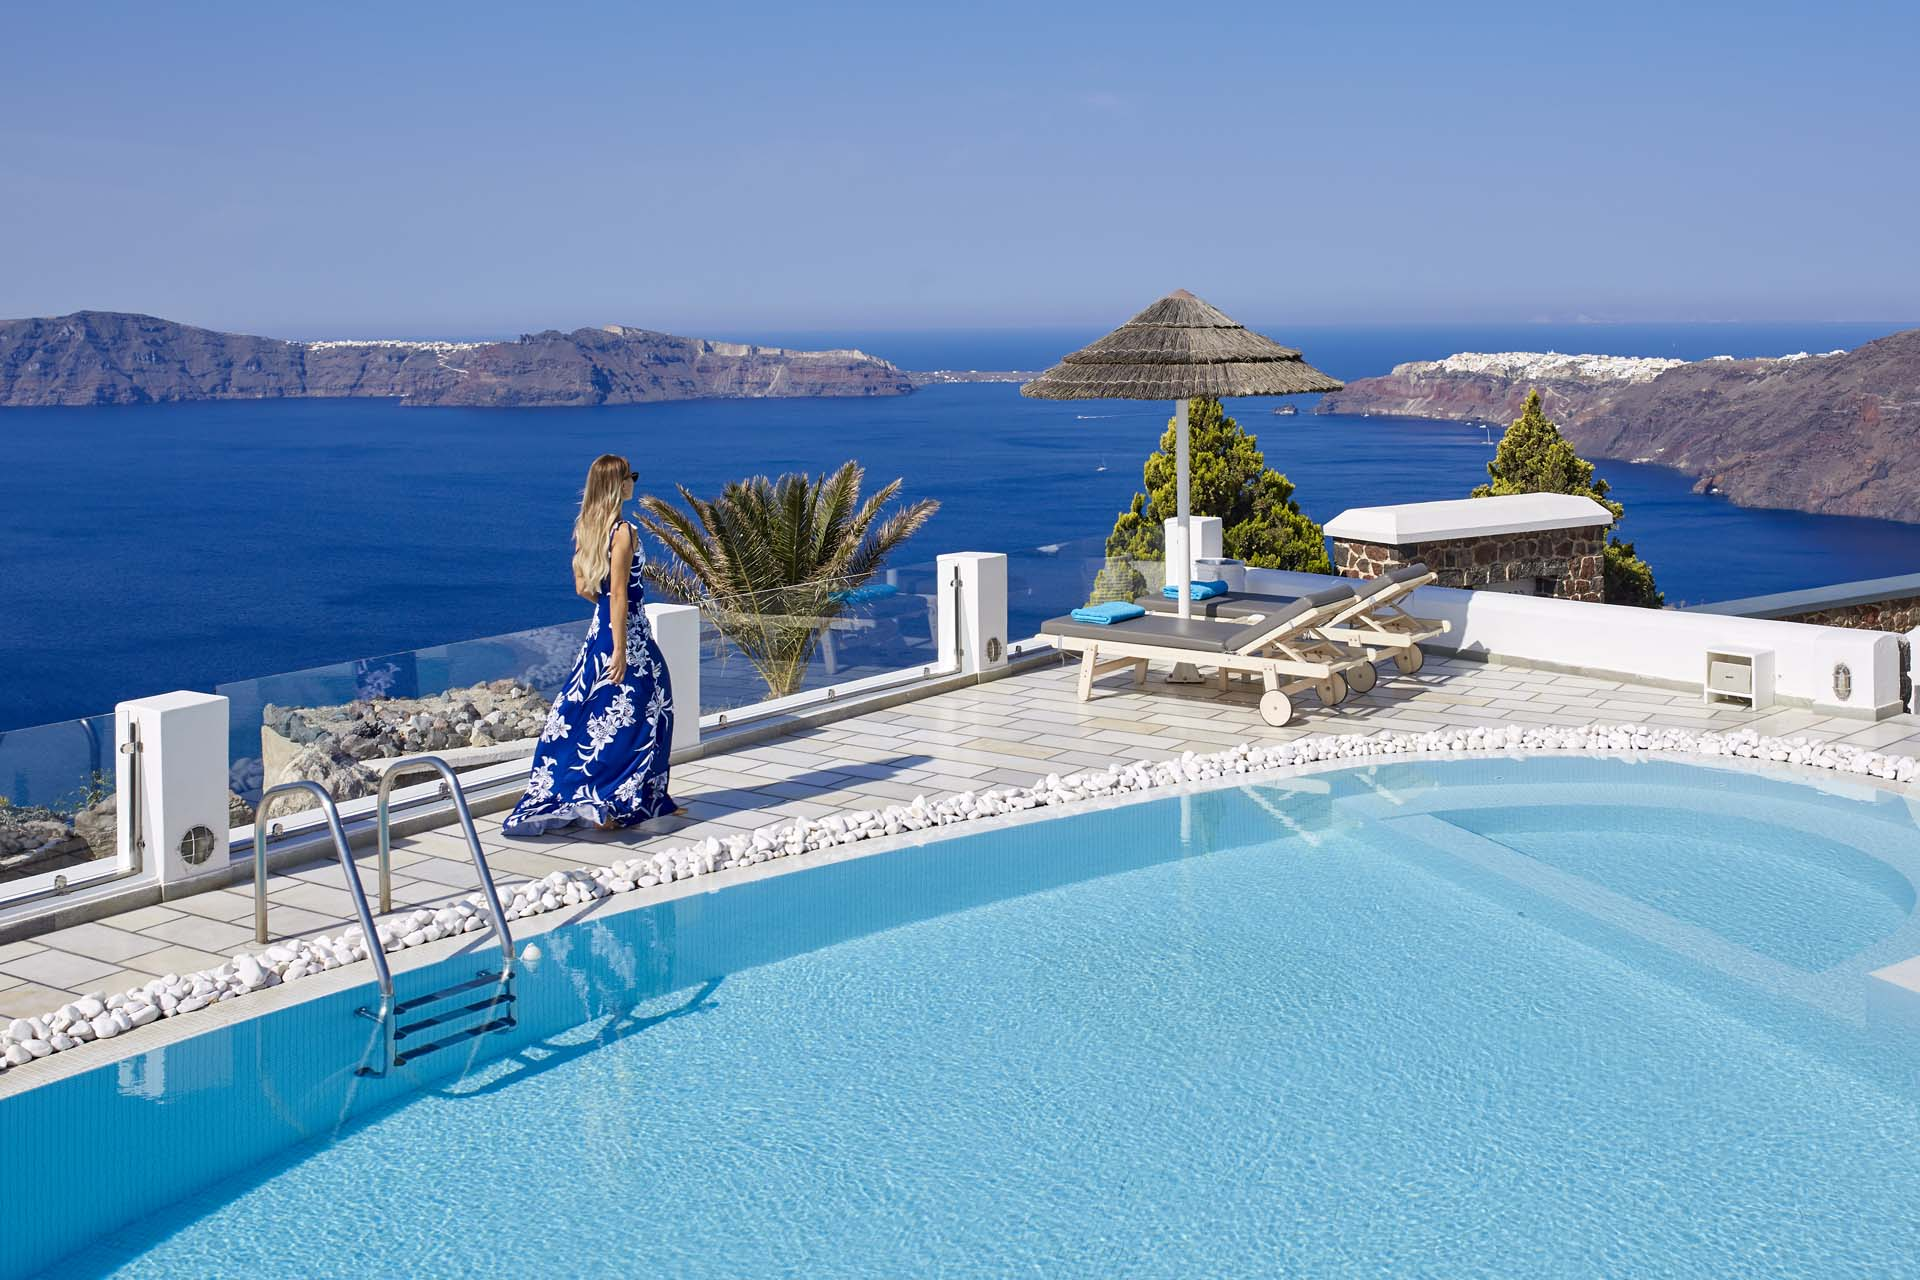 SWIMMING POOL | Santorini Princess Luxury Hotel